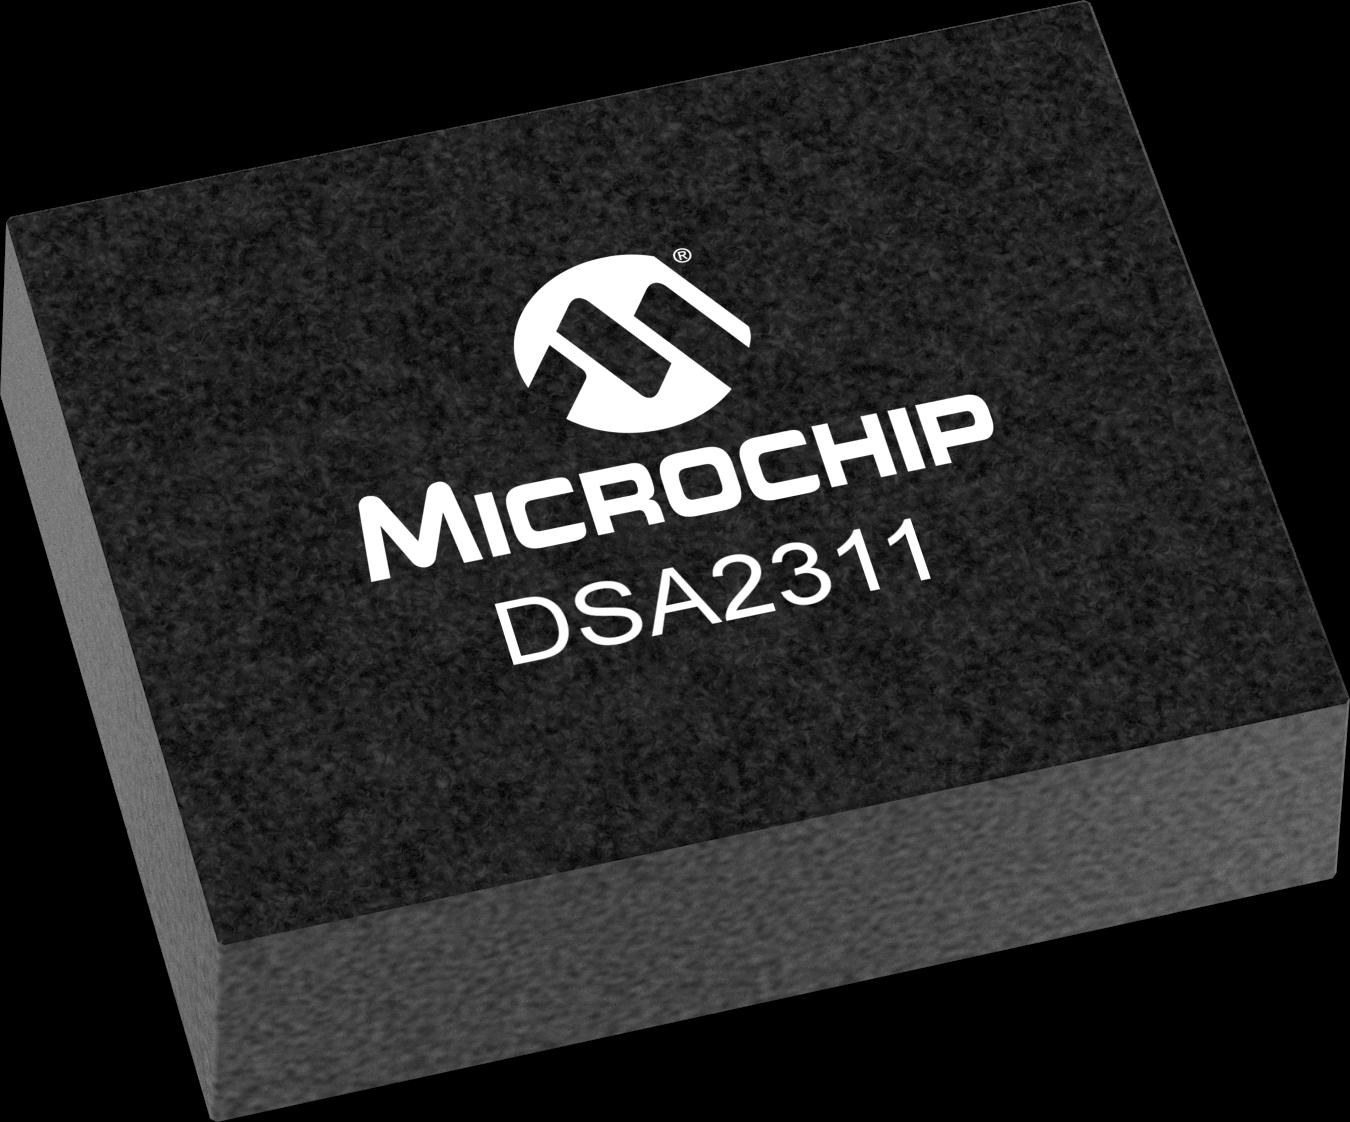 dsa2311-vdfn-6_multi-output_chip